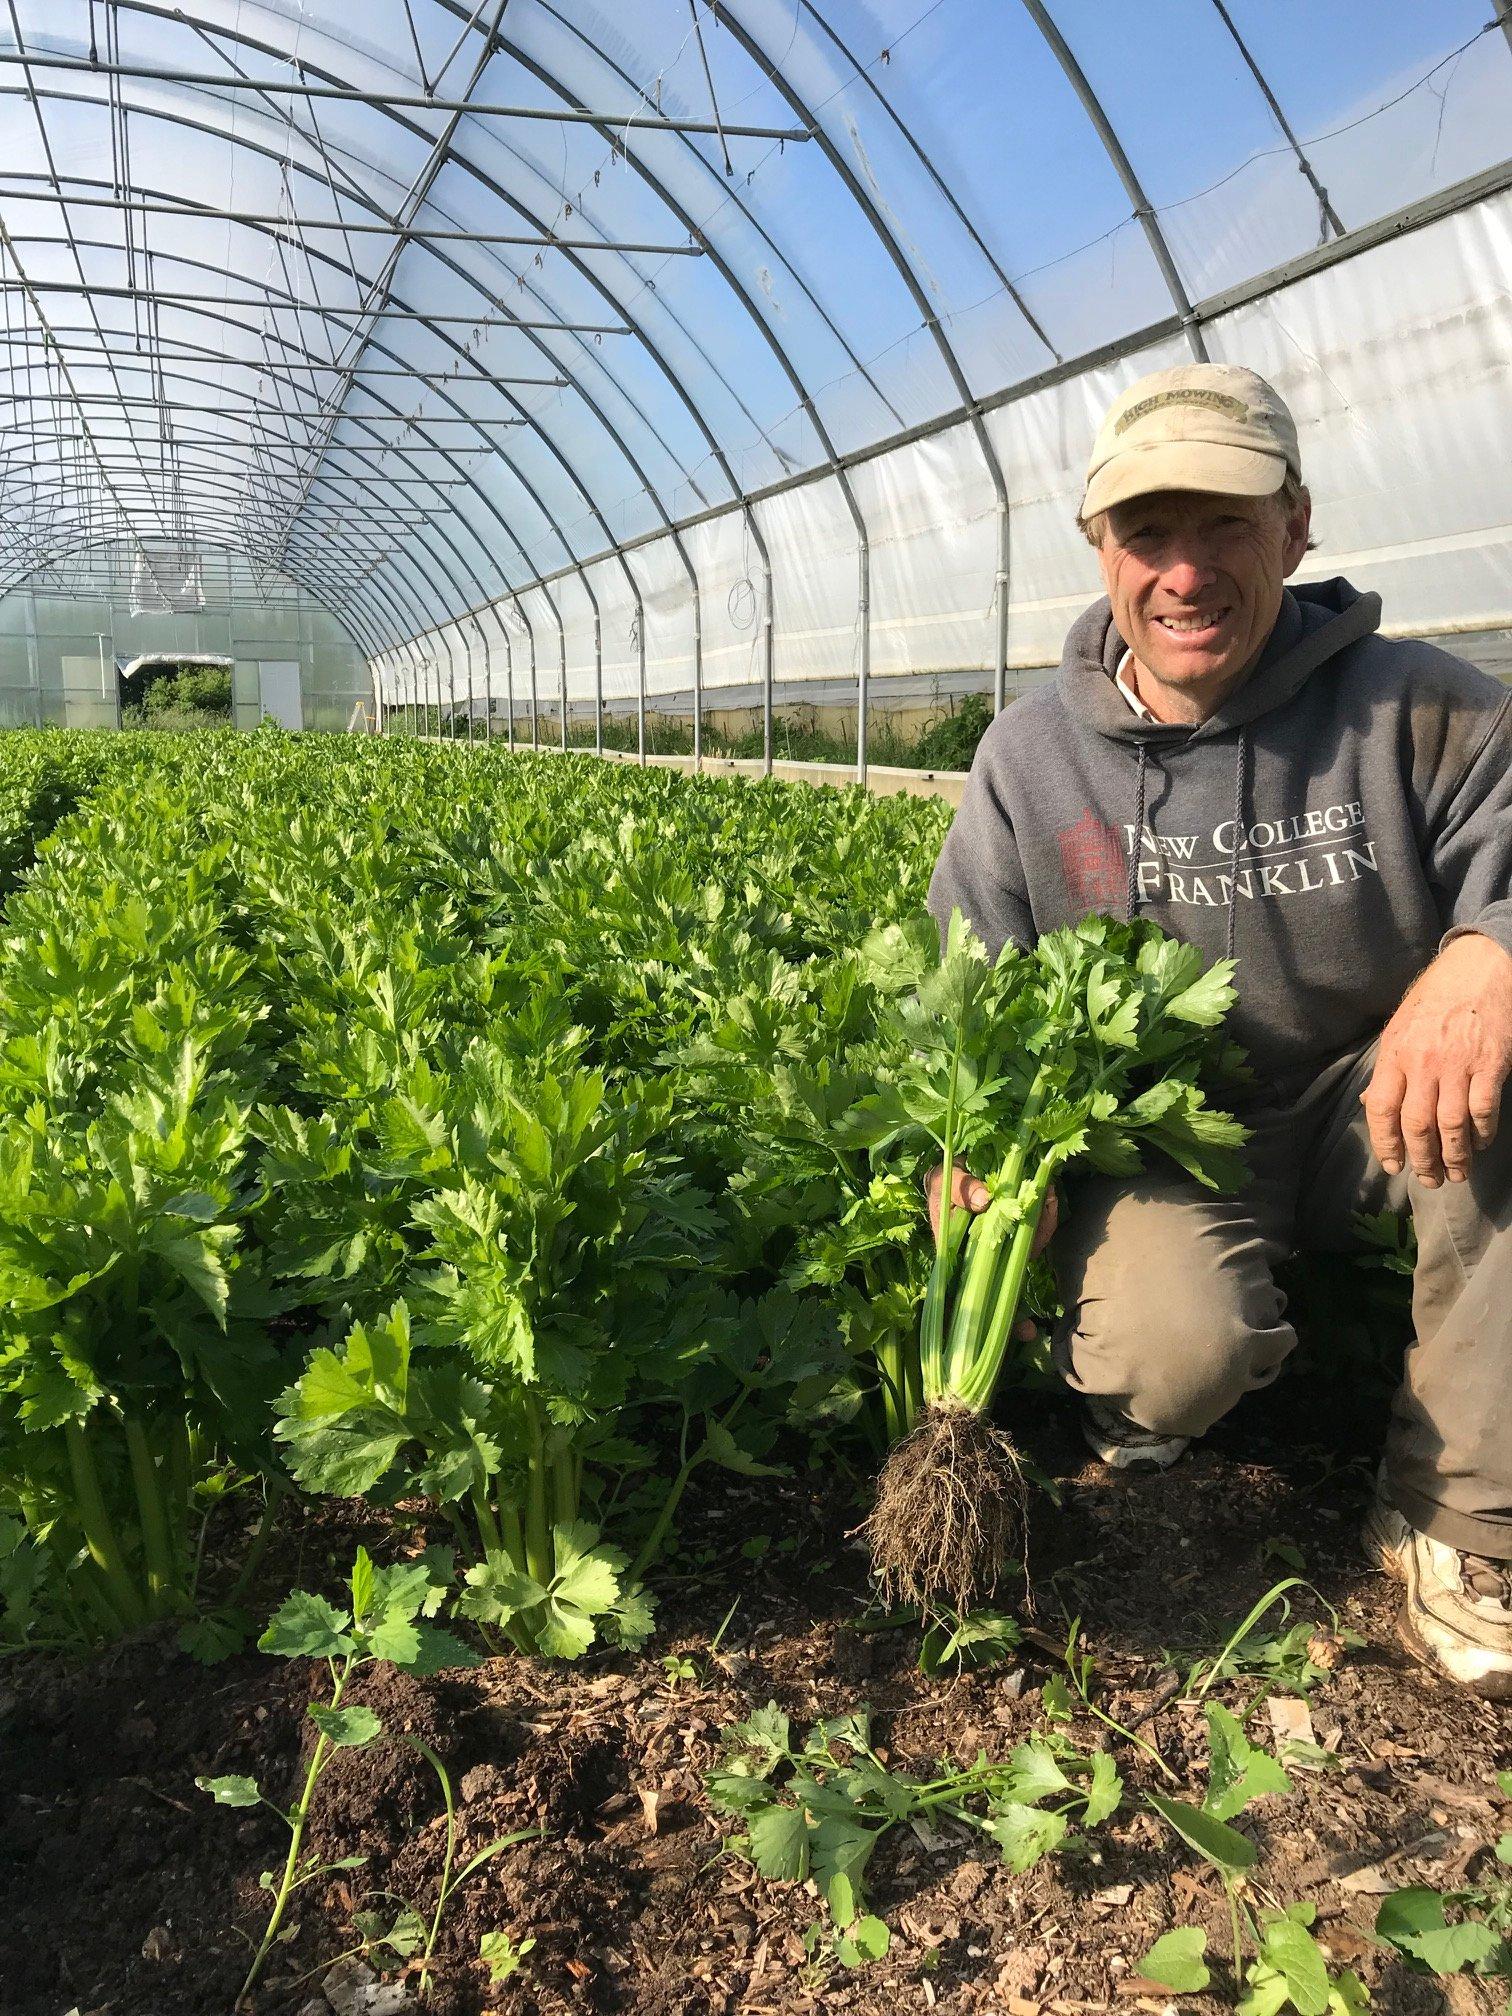 Farm Happenings for June 25, 2019